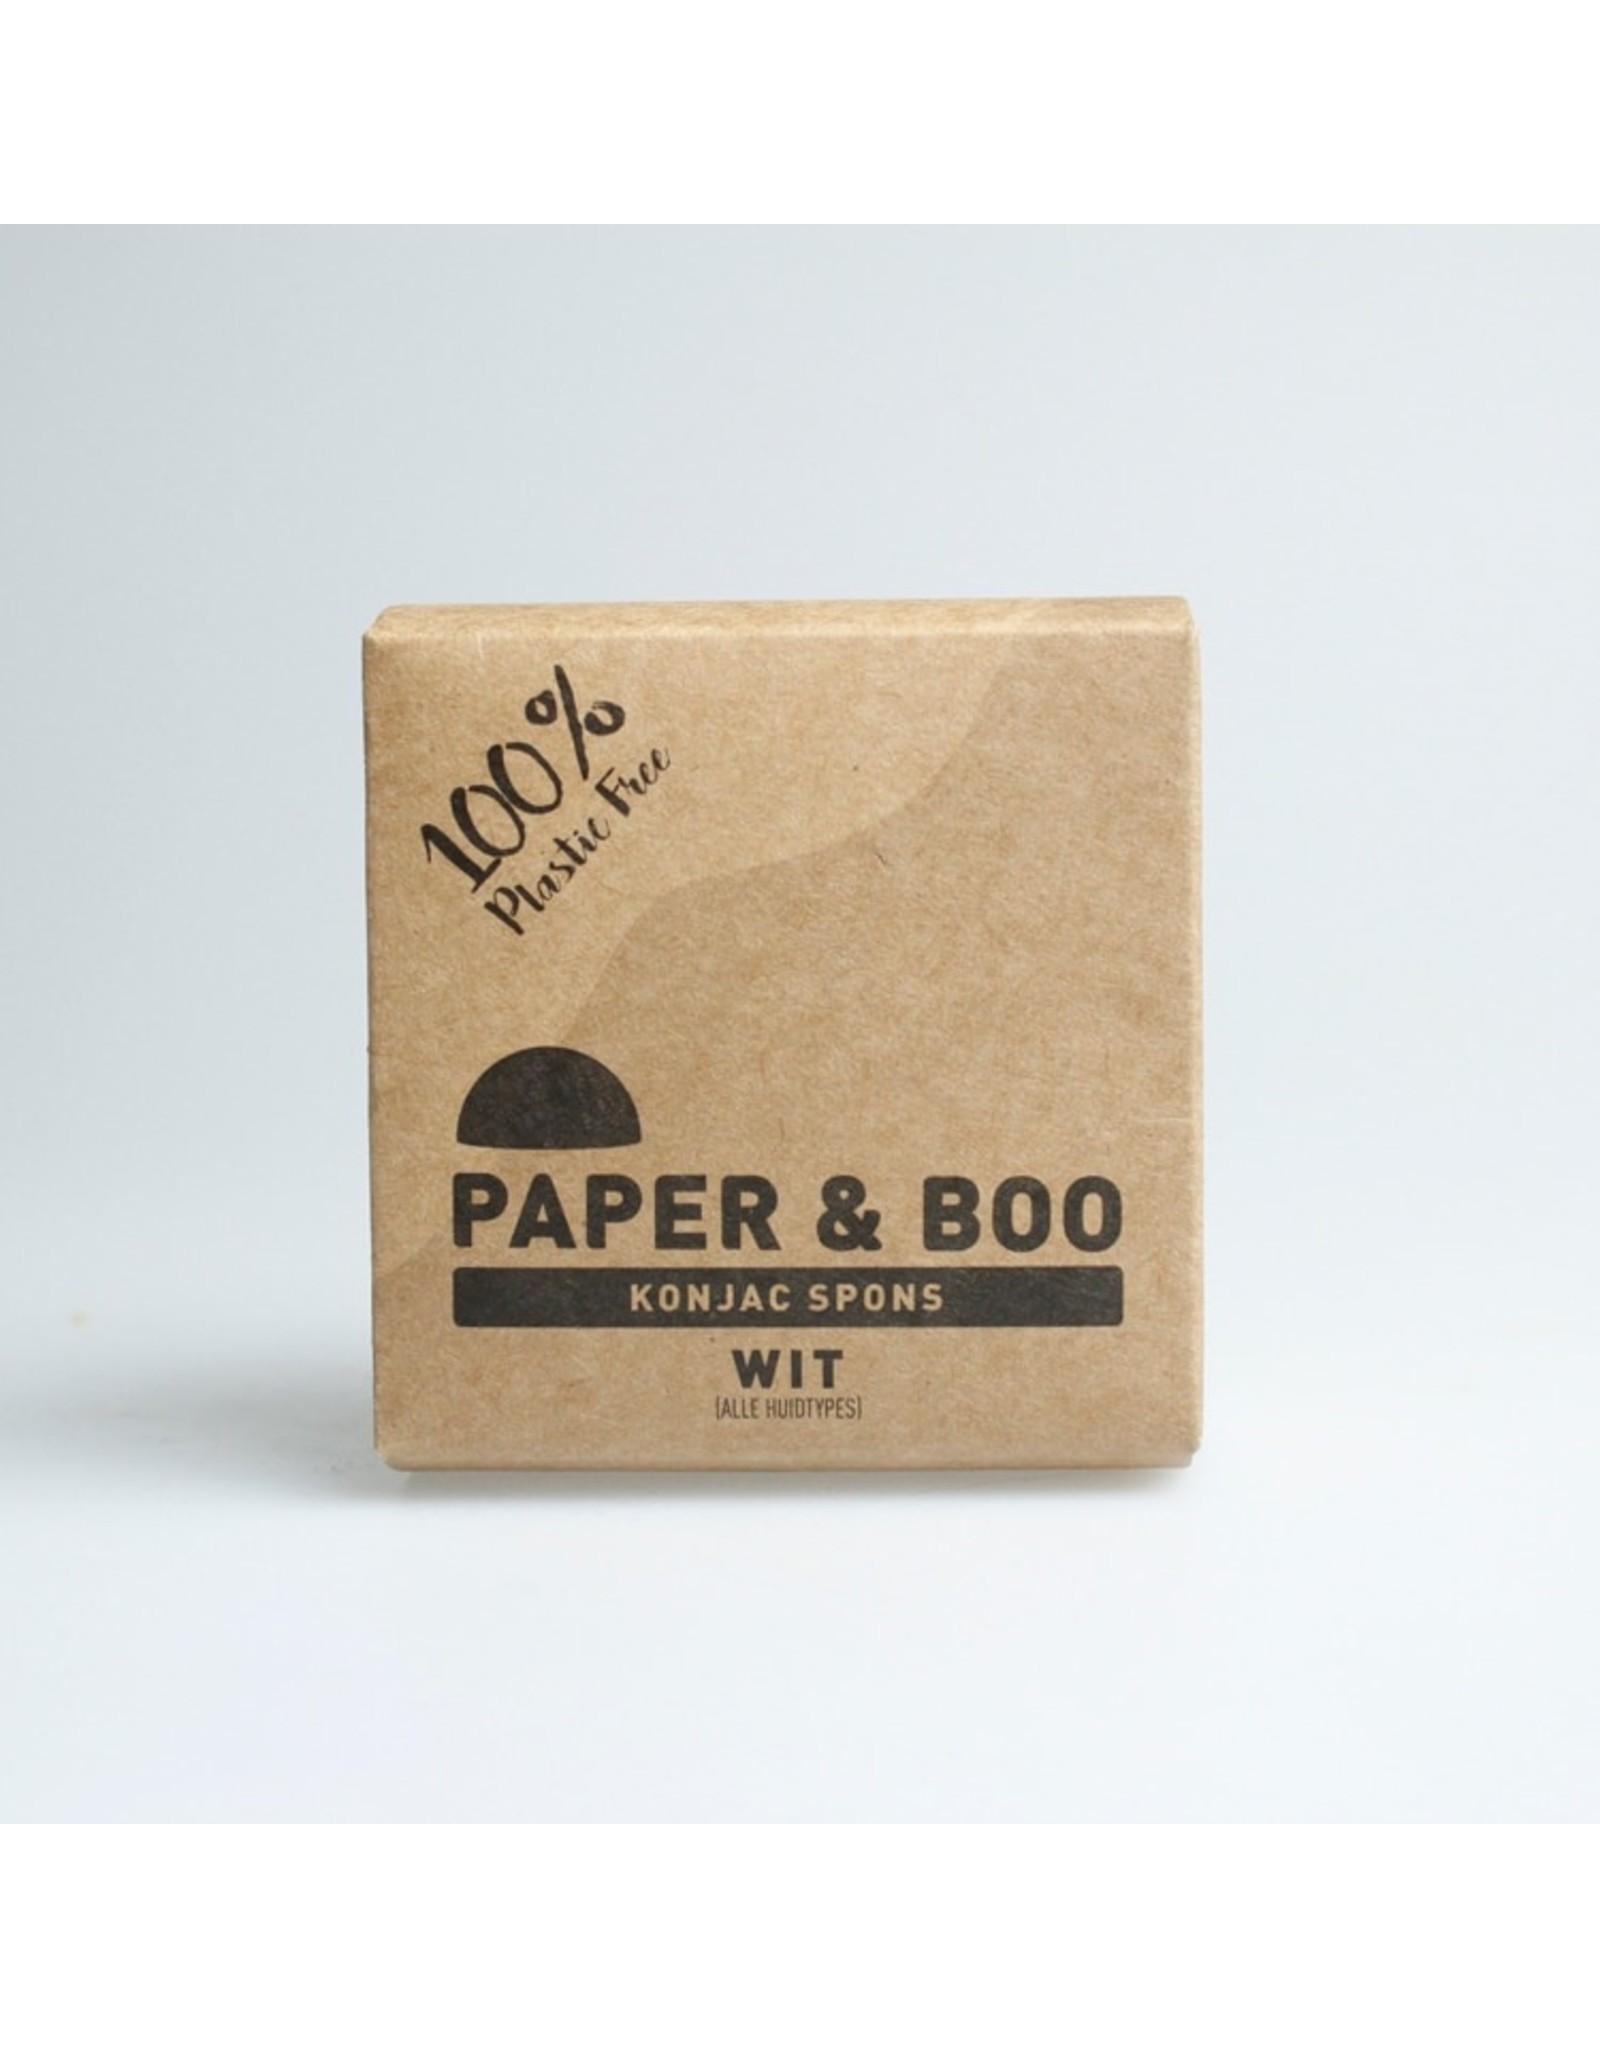 PAPER & BOO Konjac spons wit ( alle huidtypes )